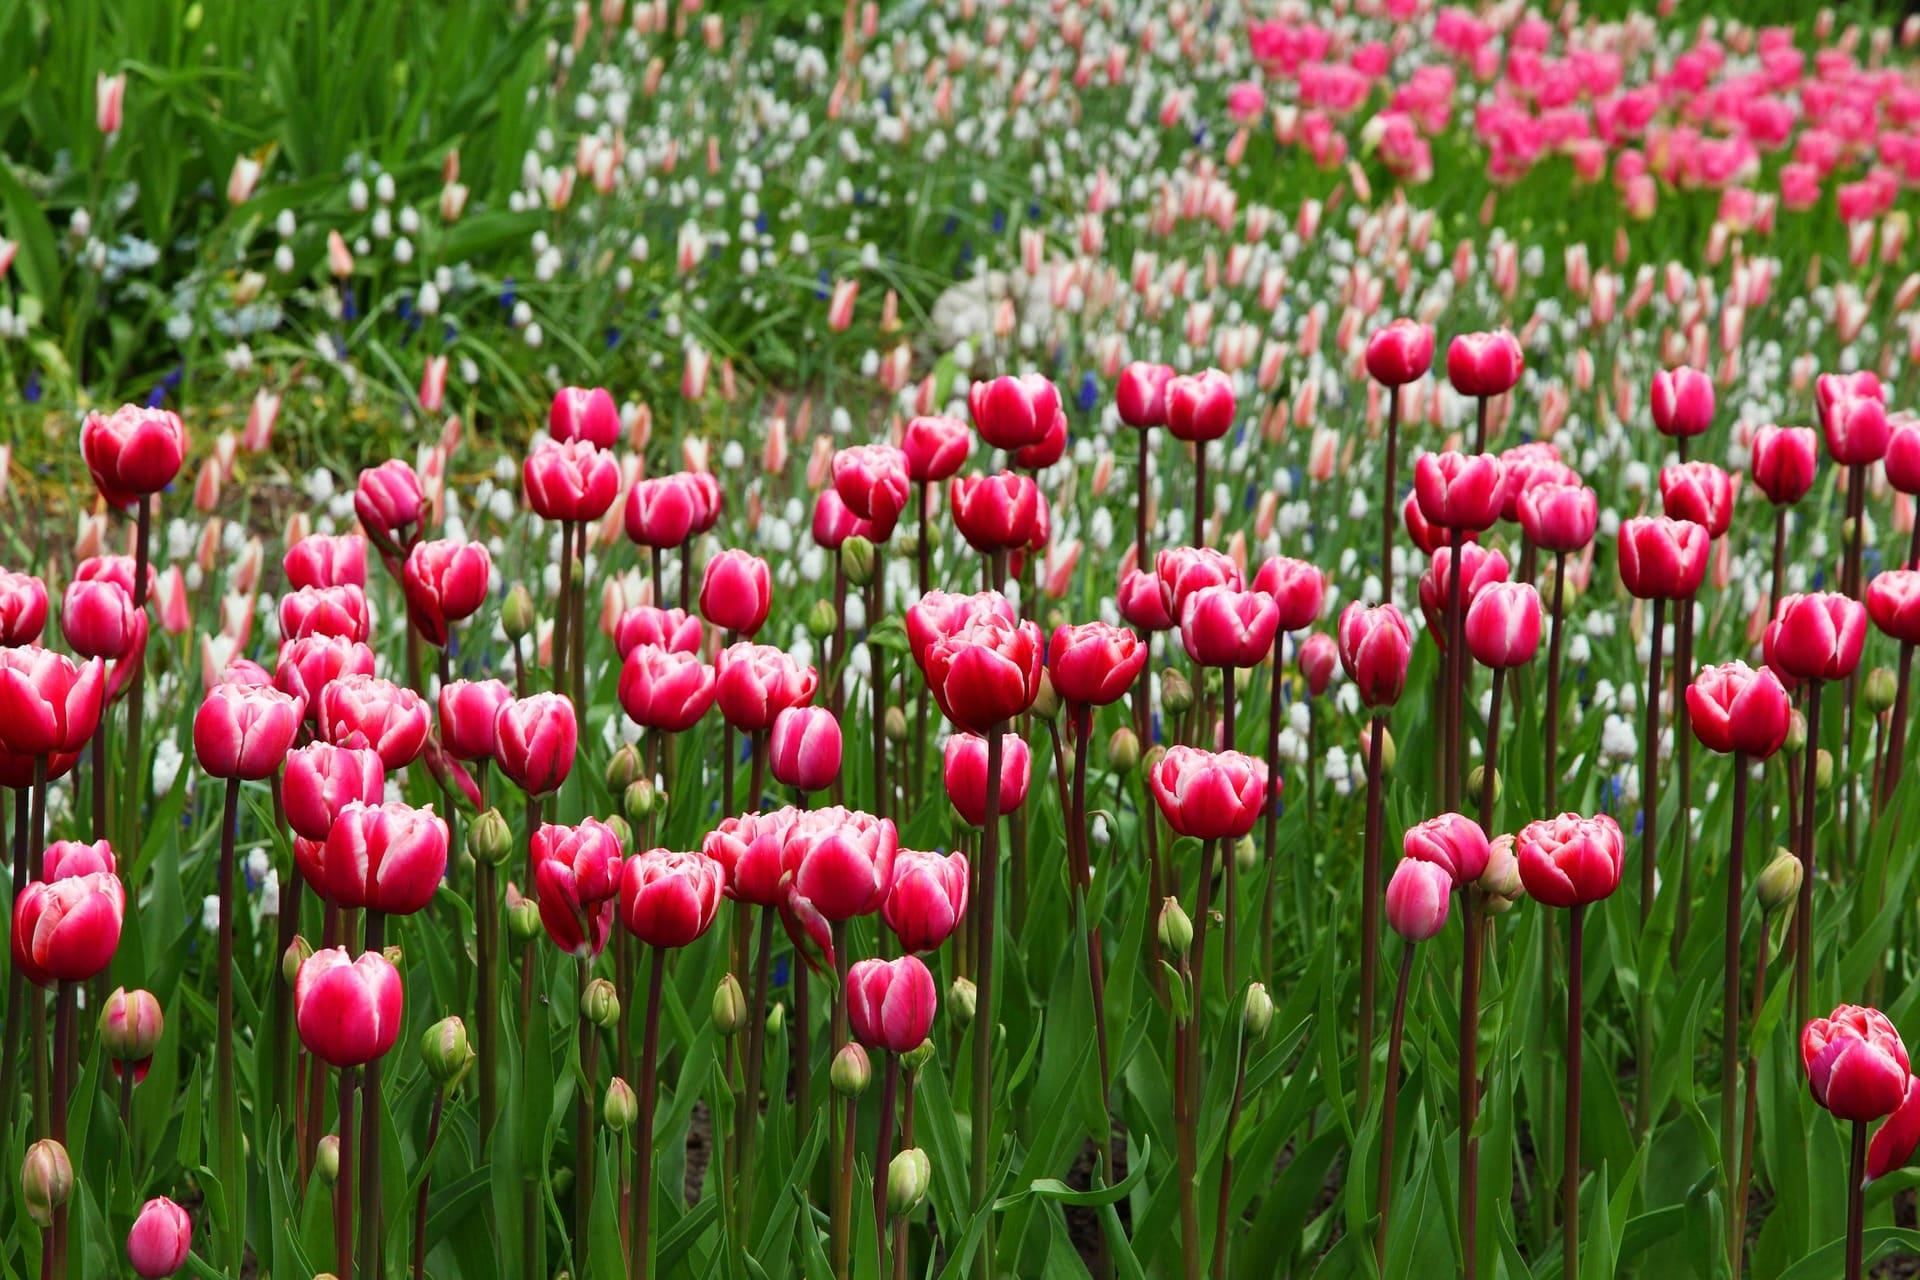 Gartenarbeit – Freude statt Belastung